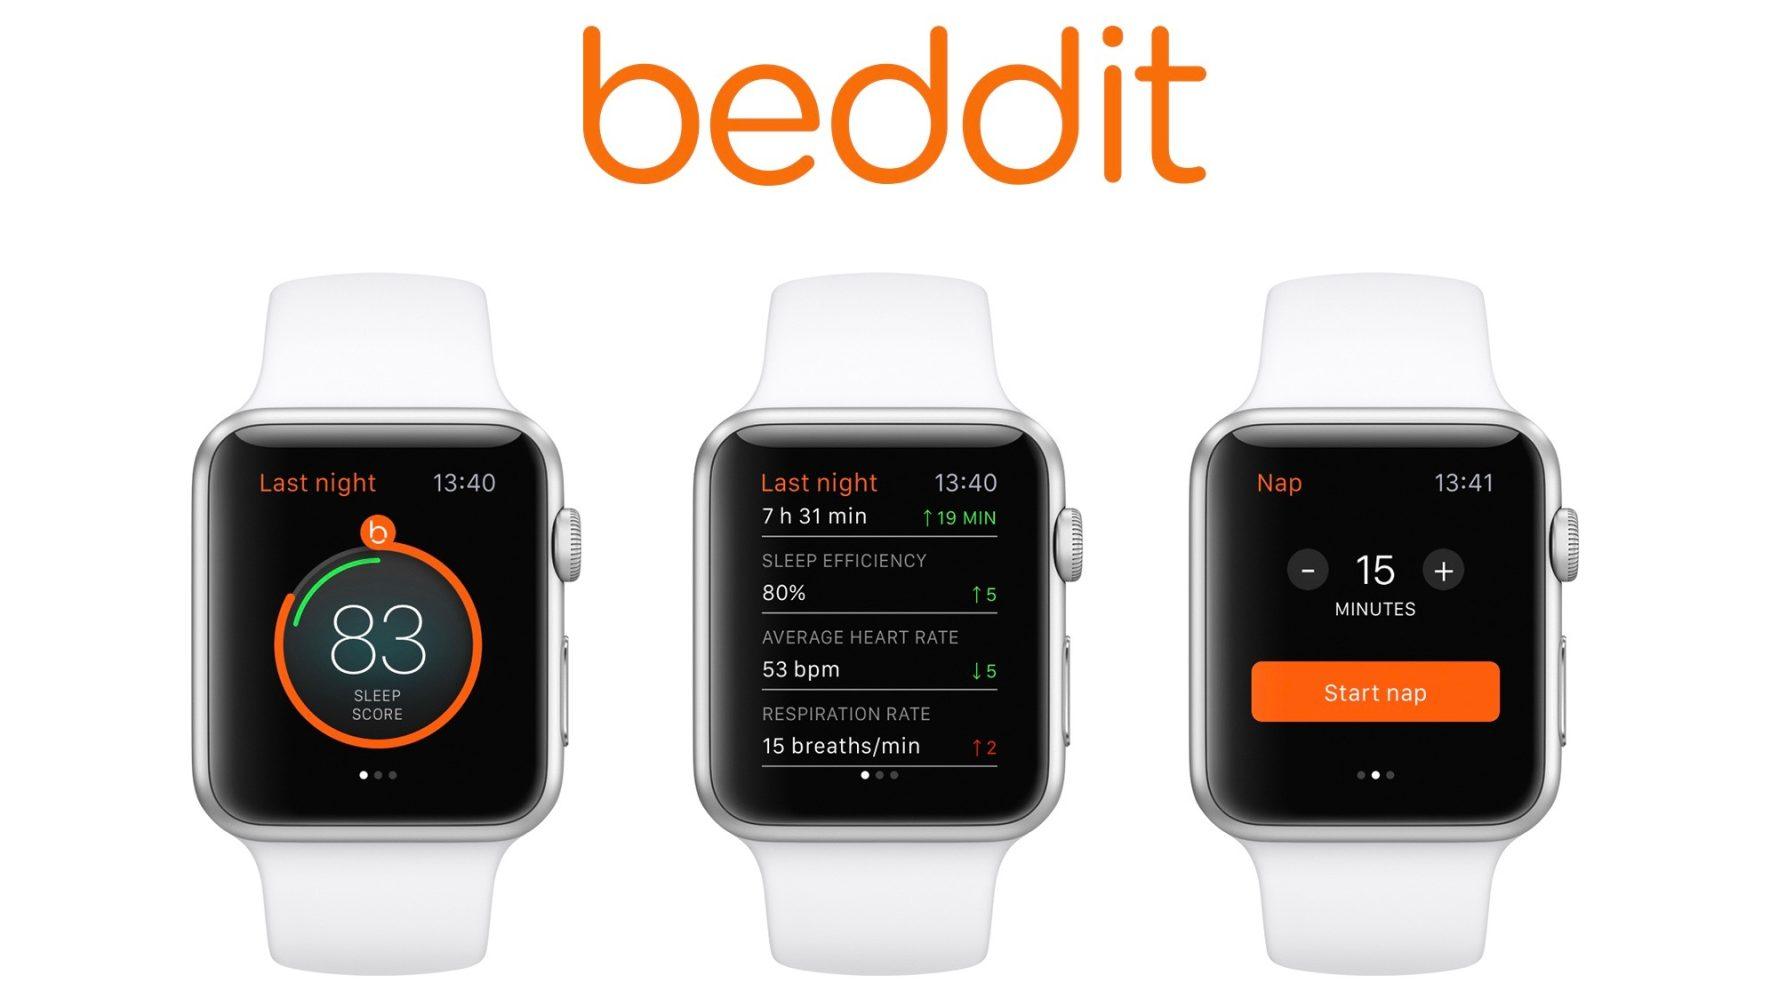 Applewatch beddit app